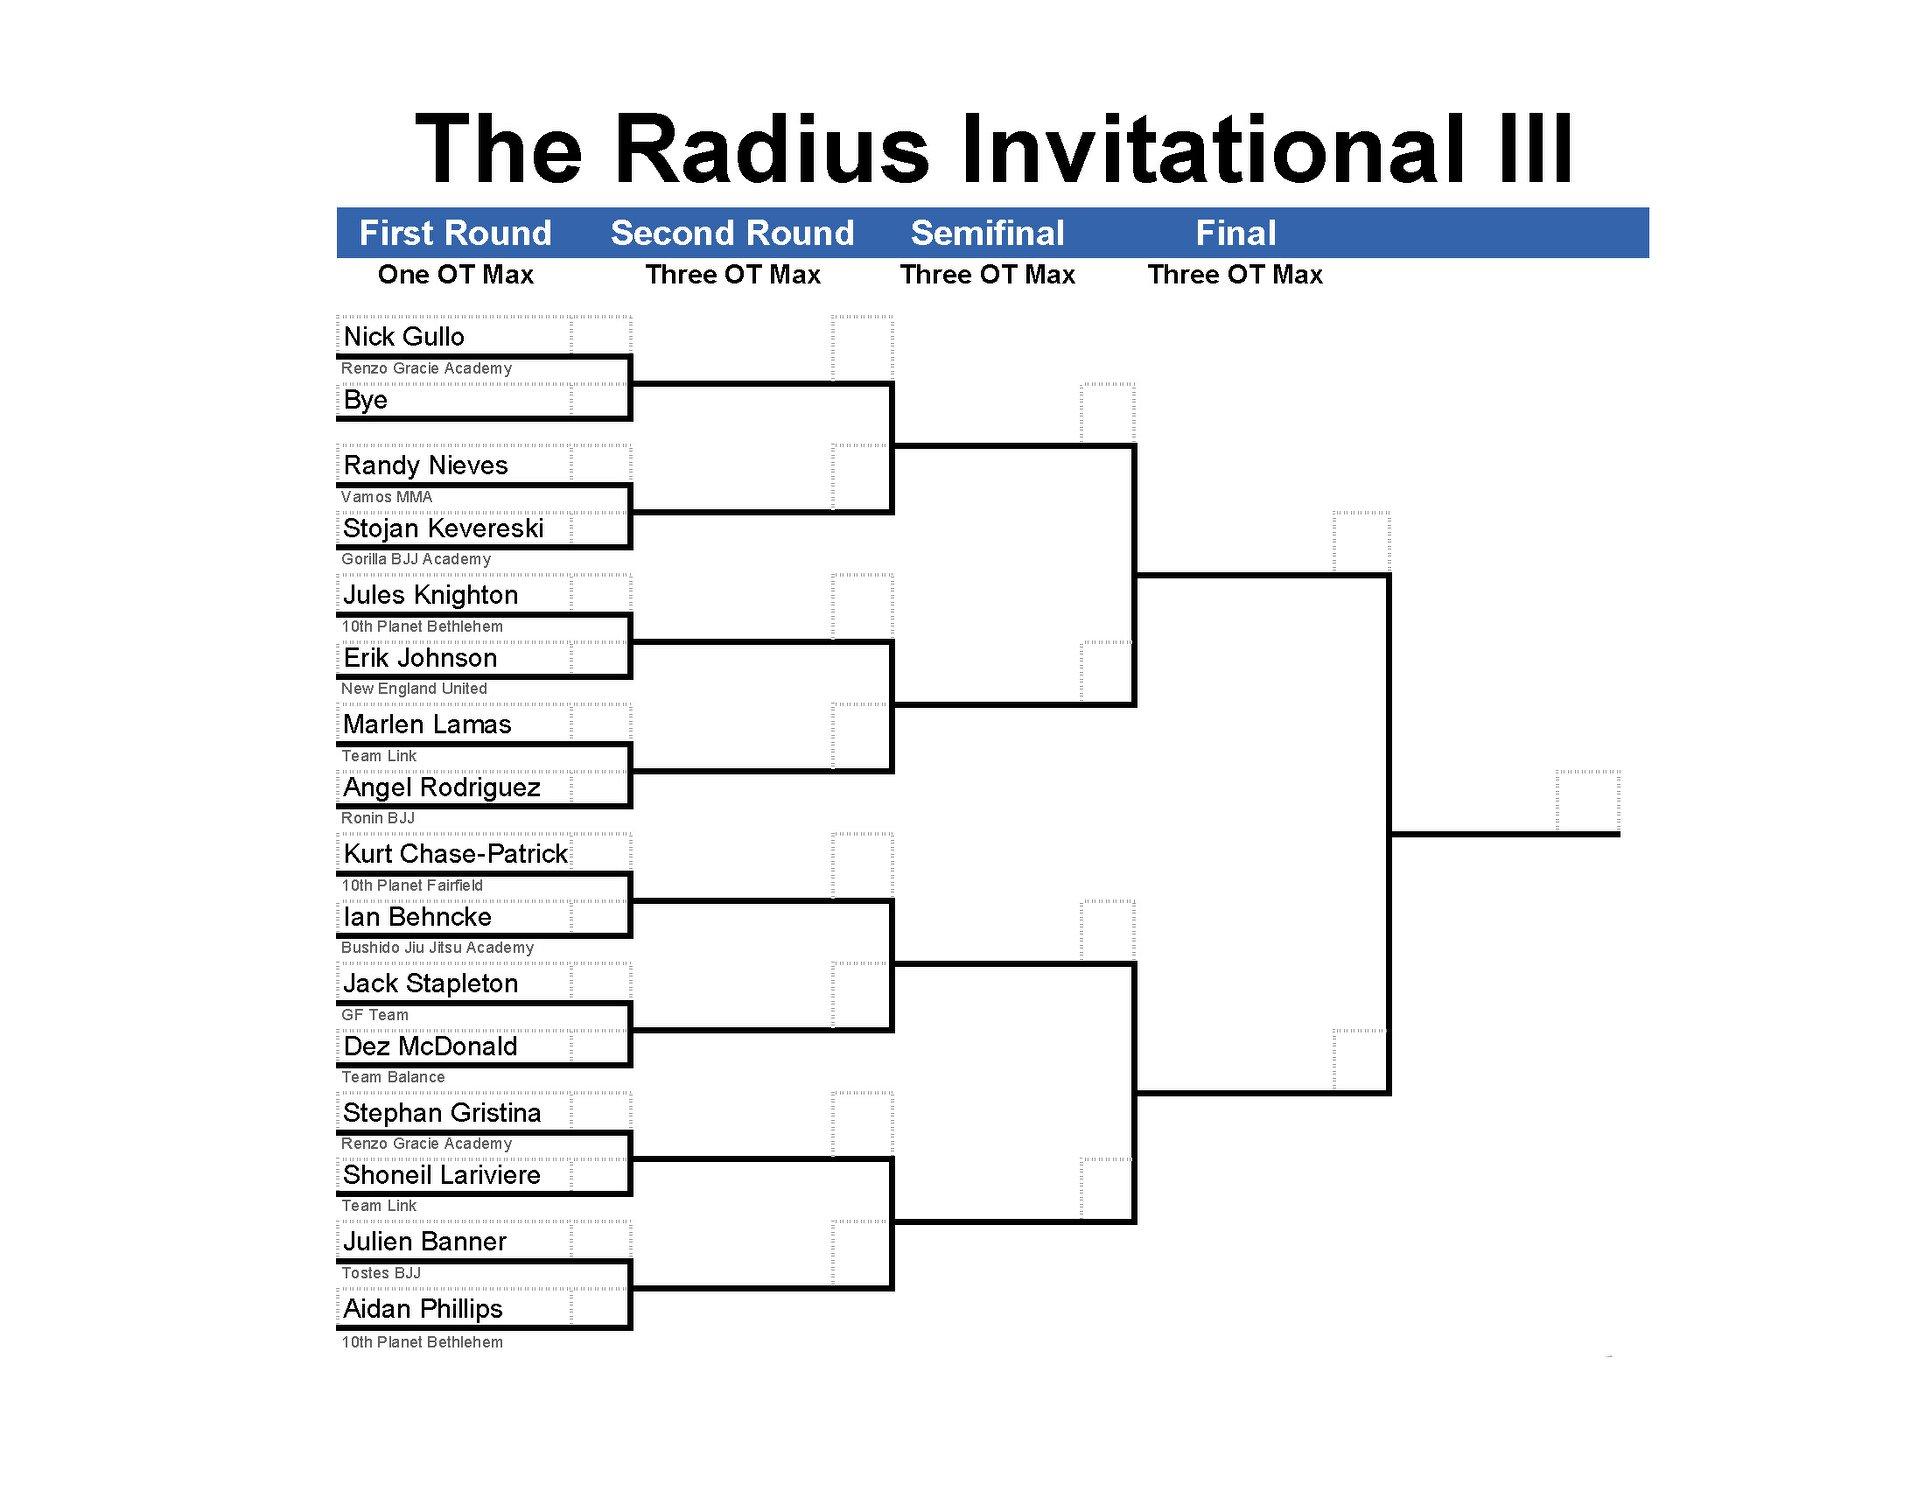 Radius International 3 bracket